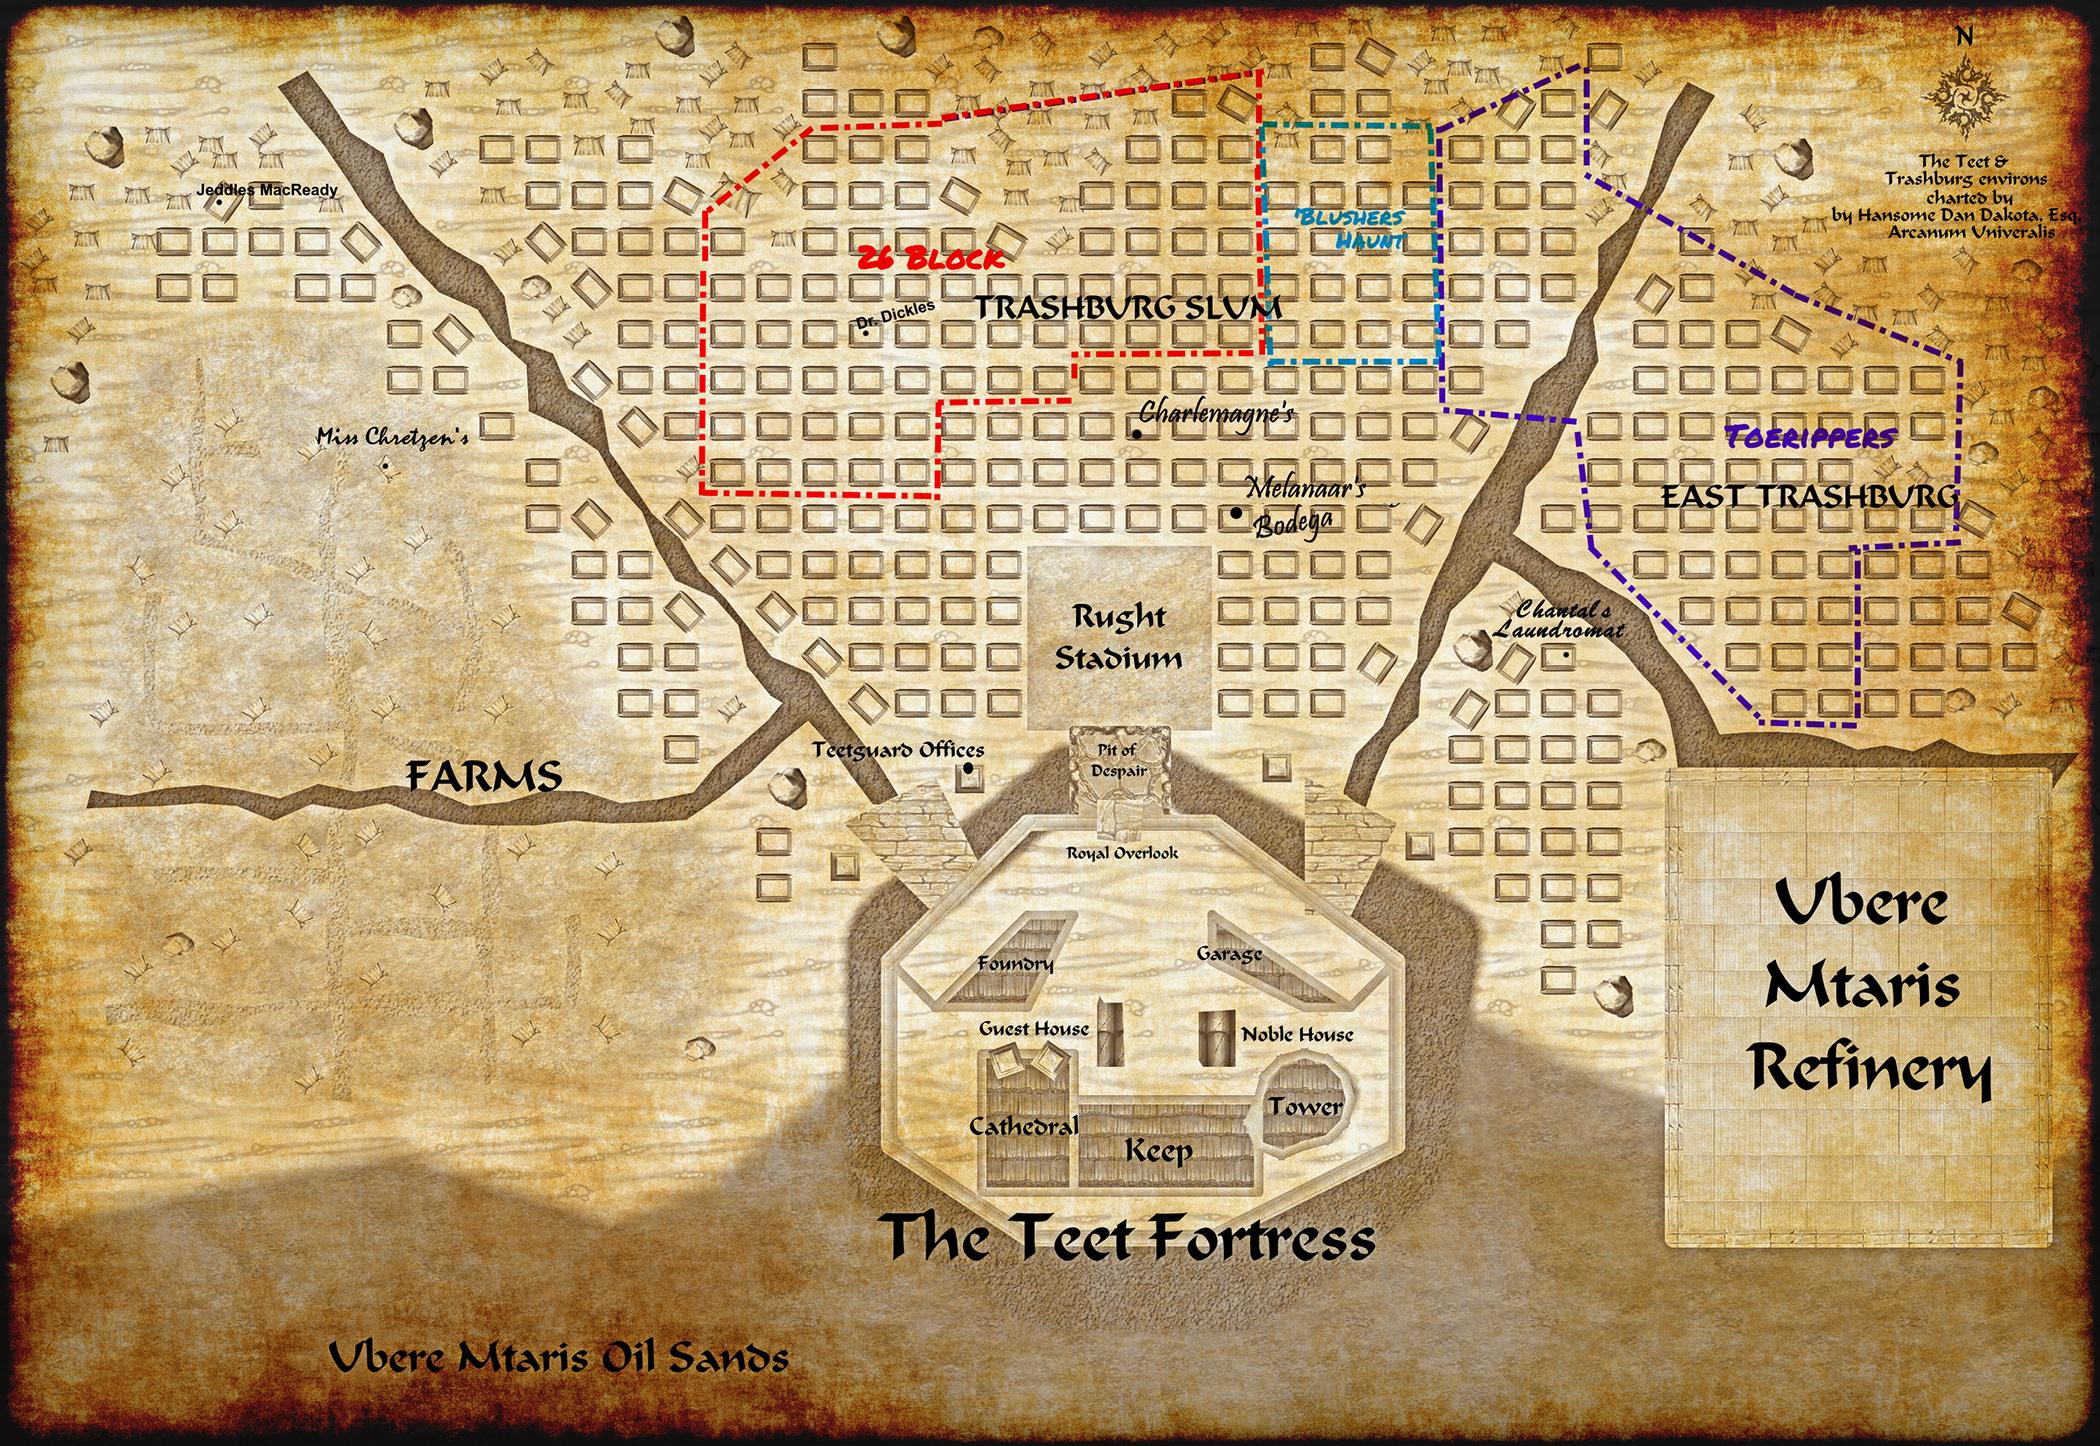 TheTeet(v2),-marked-by-Charlemagne.jpg